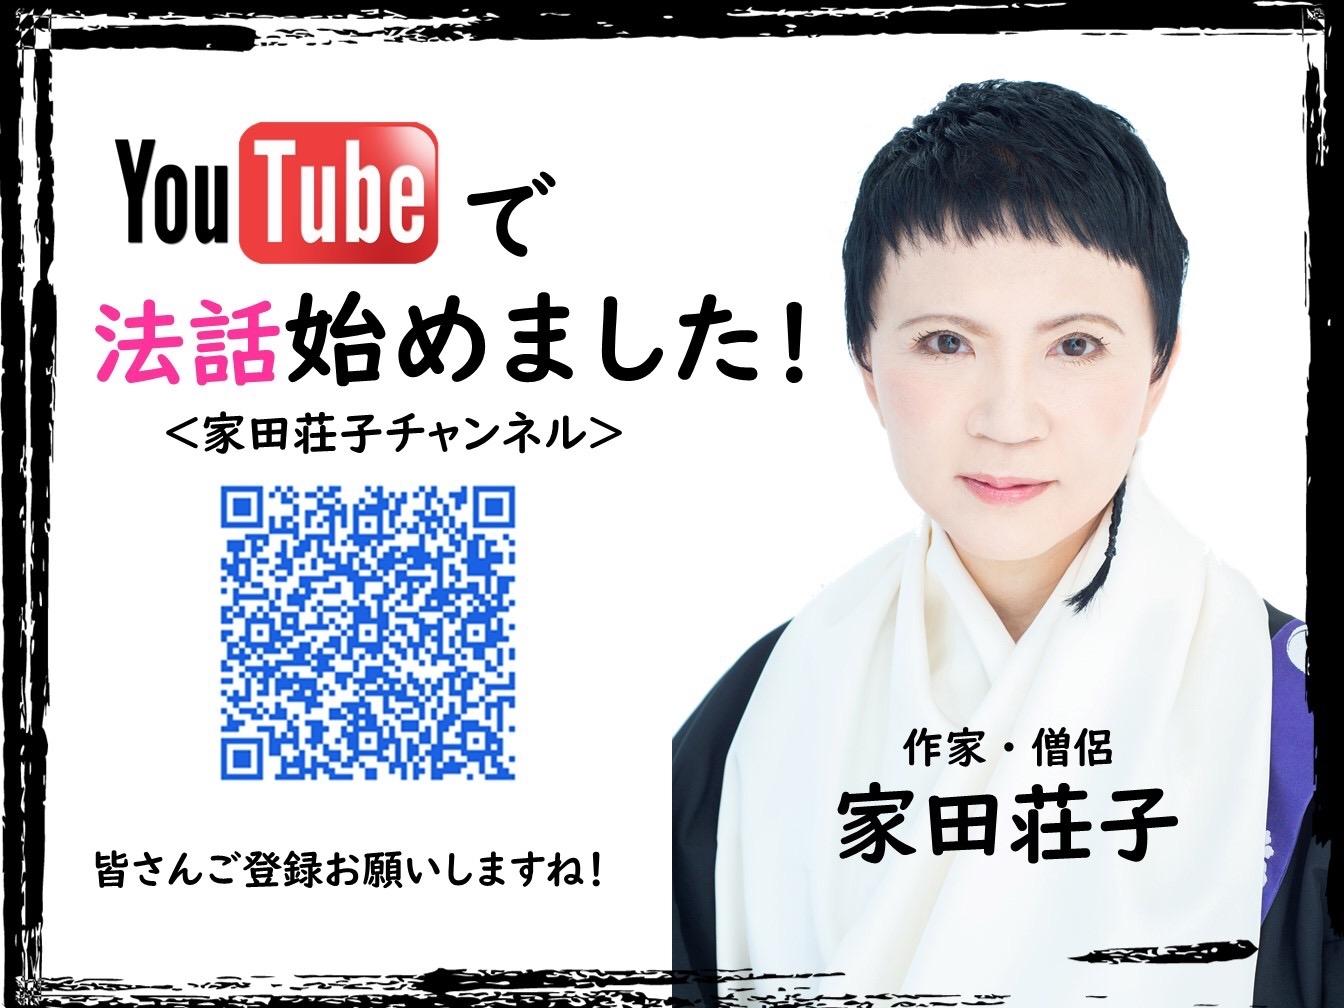 YouTubeこころの法話 新作 弘法大師空海の少年時代_d0339676_19350913.jpg